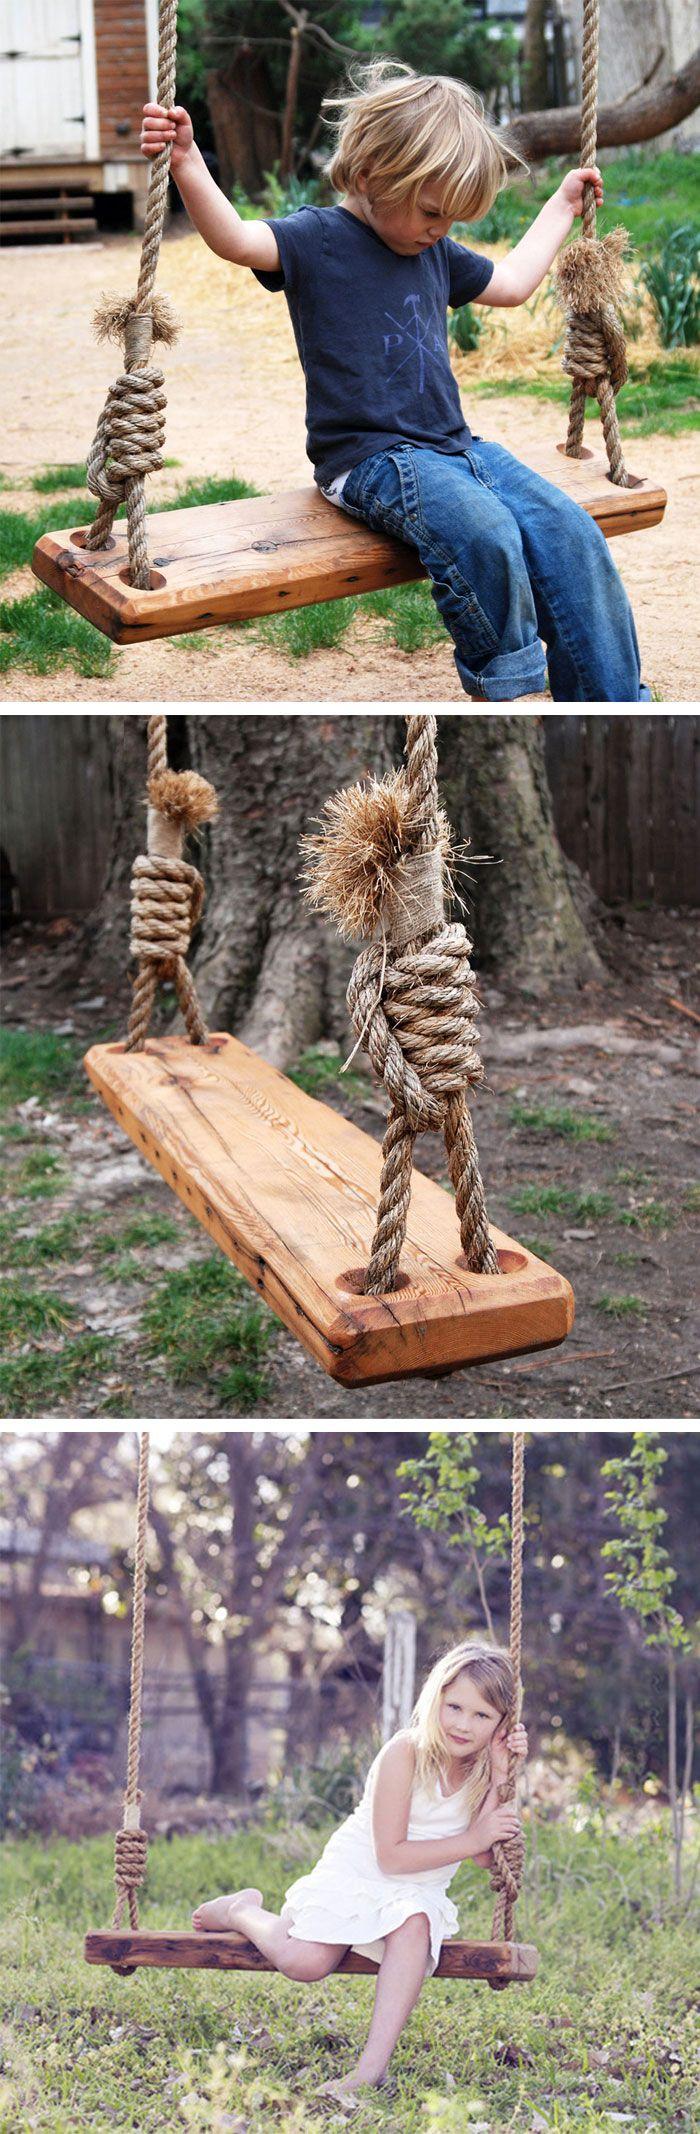 DIY tree swing #product_design